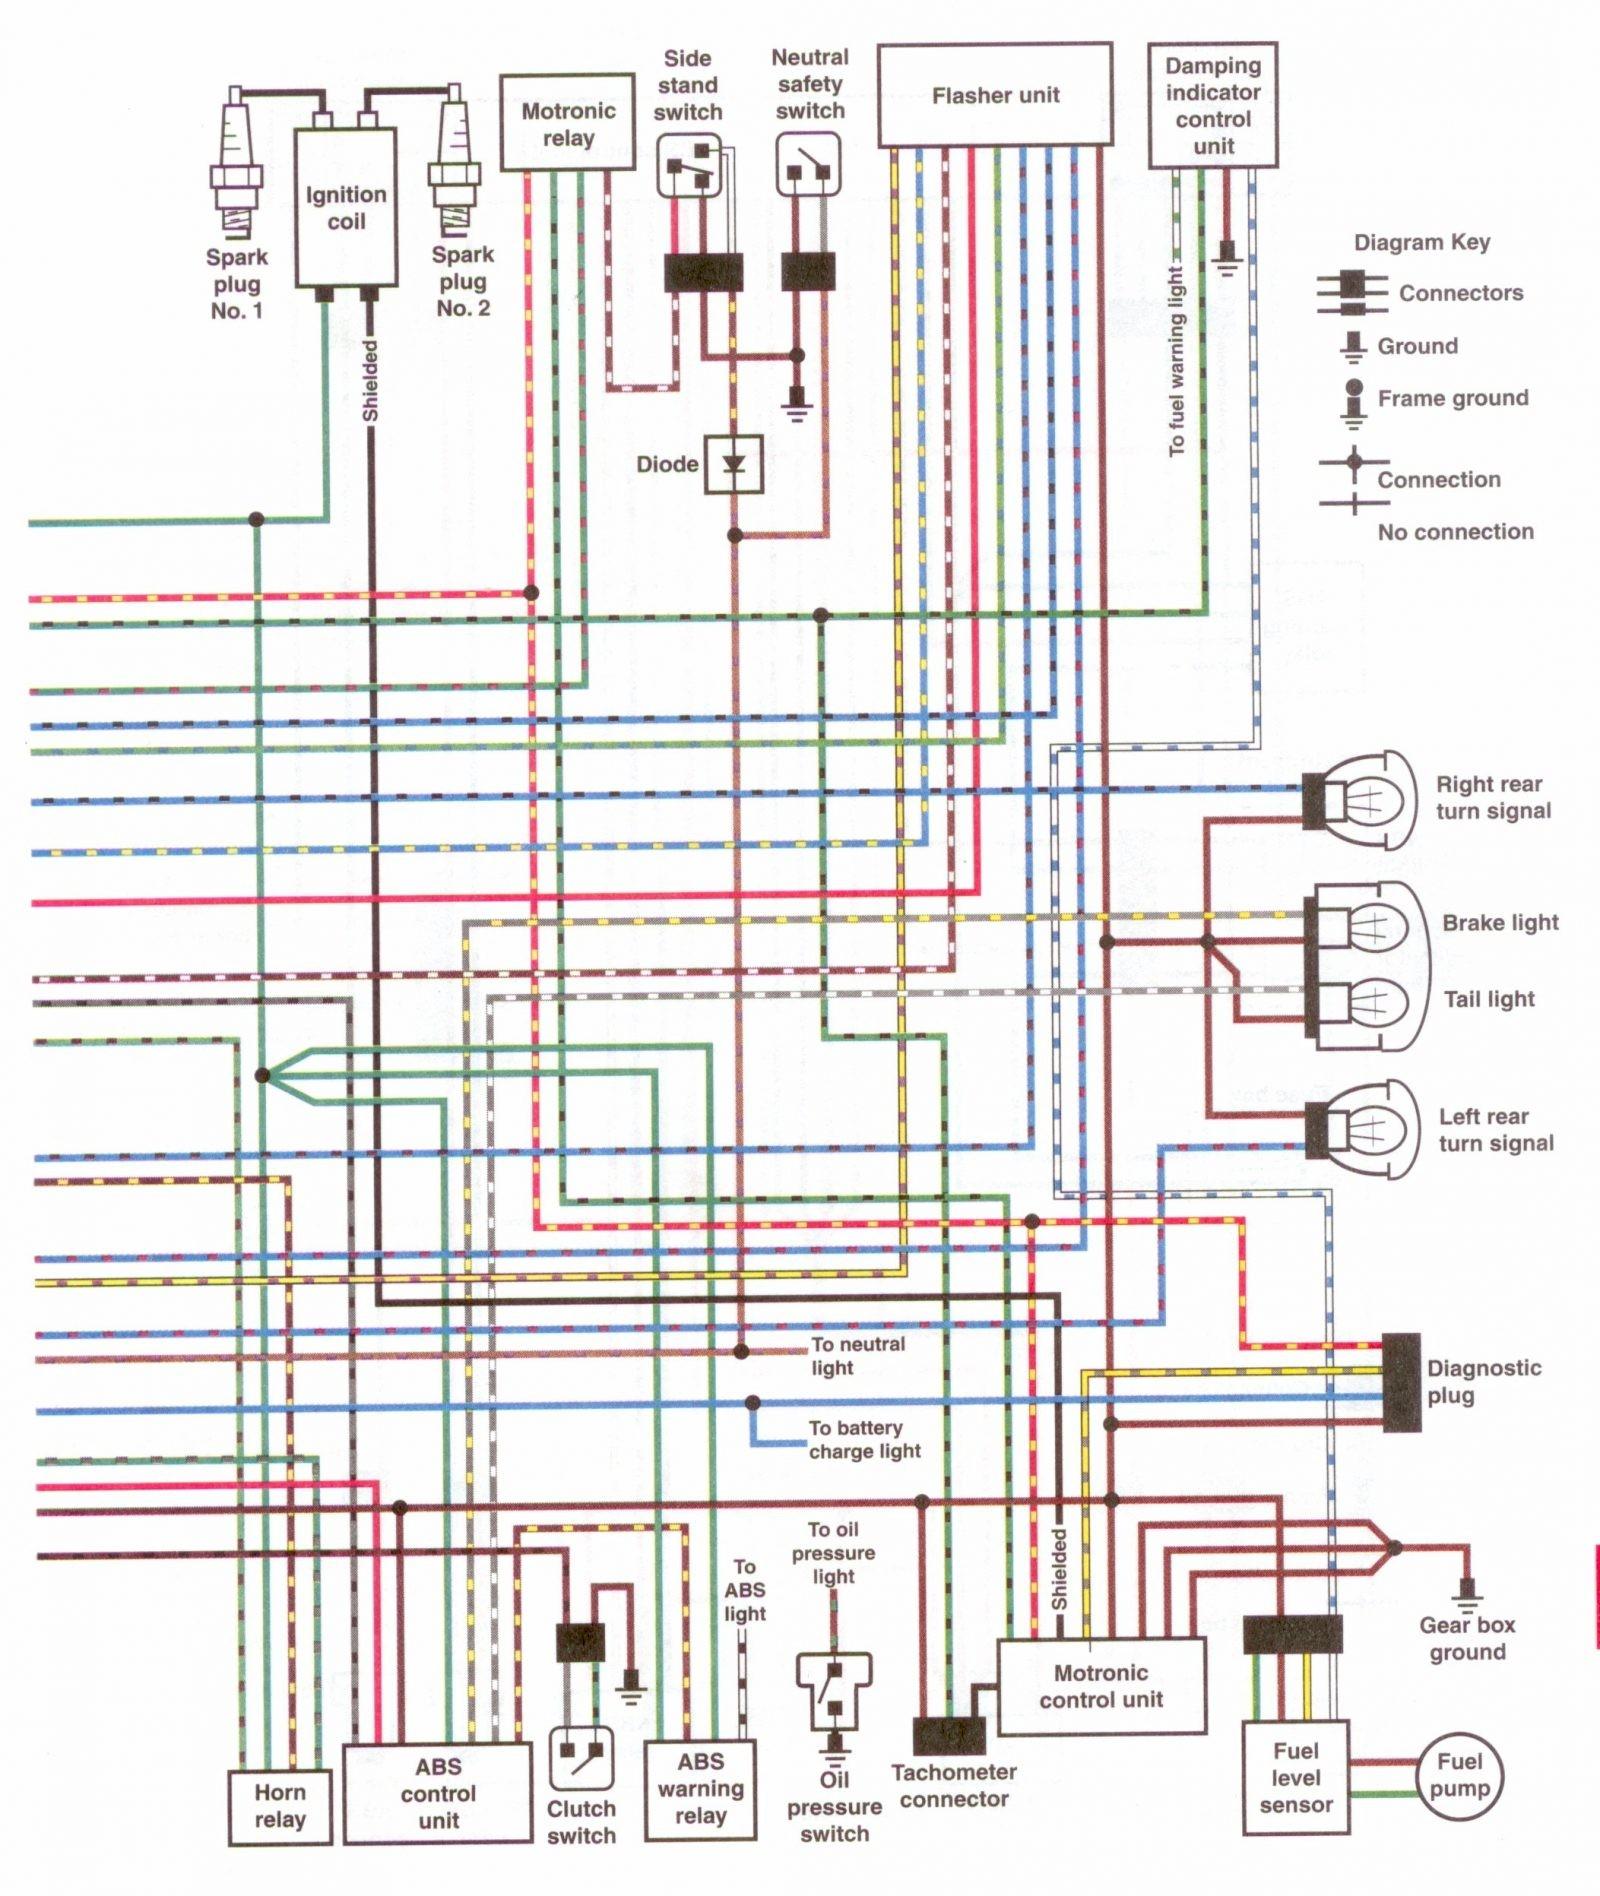 Lenel Access Control Wiring Diagram Lenel 1320 Wiring Diagram Copy Dome Cameraing Diagram with for Of Lenel Access Control Wiring Diagram